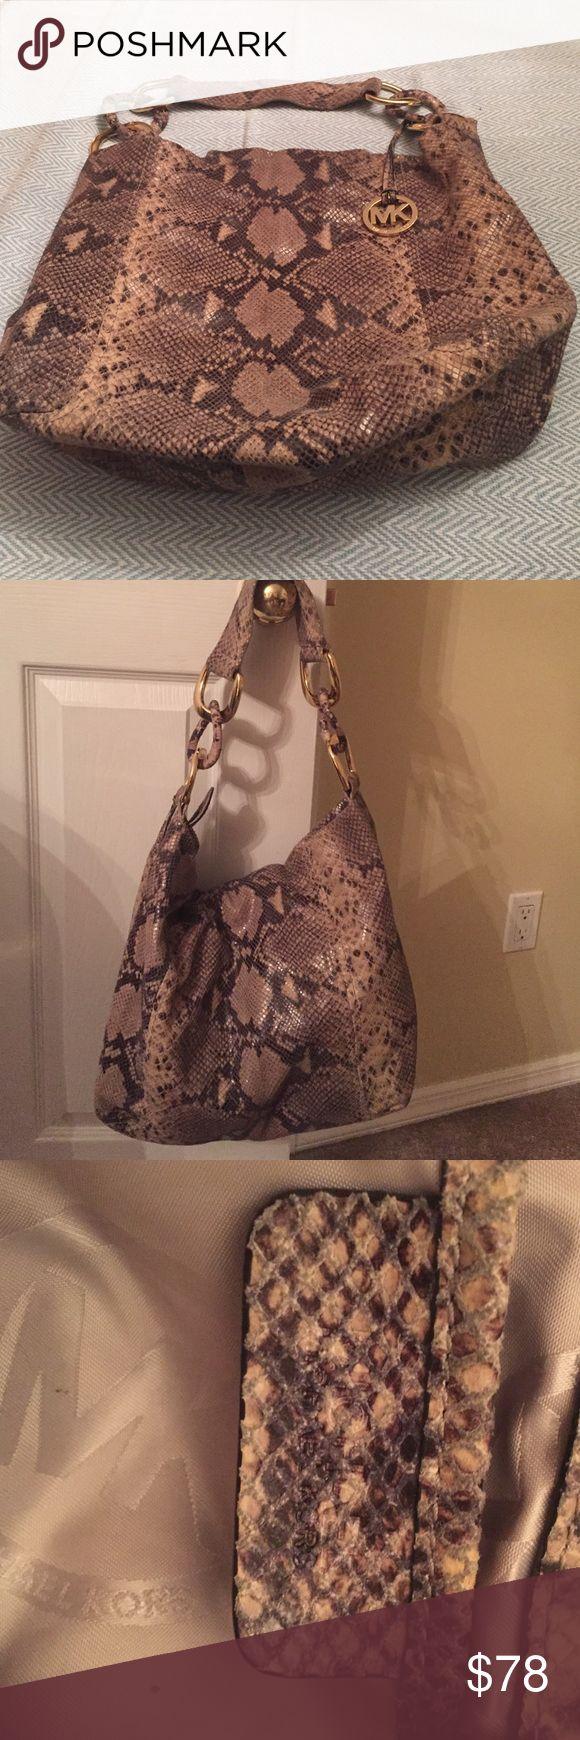 Michael Kors Summer Bag Price Reduction Michael Kors Bag lightly used great Condition Michael Kors Bags Satchels